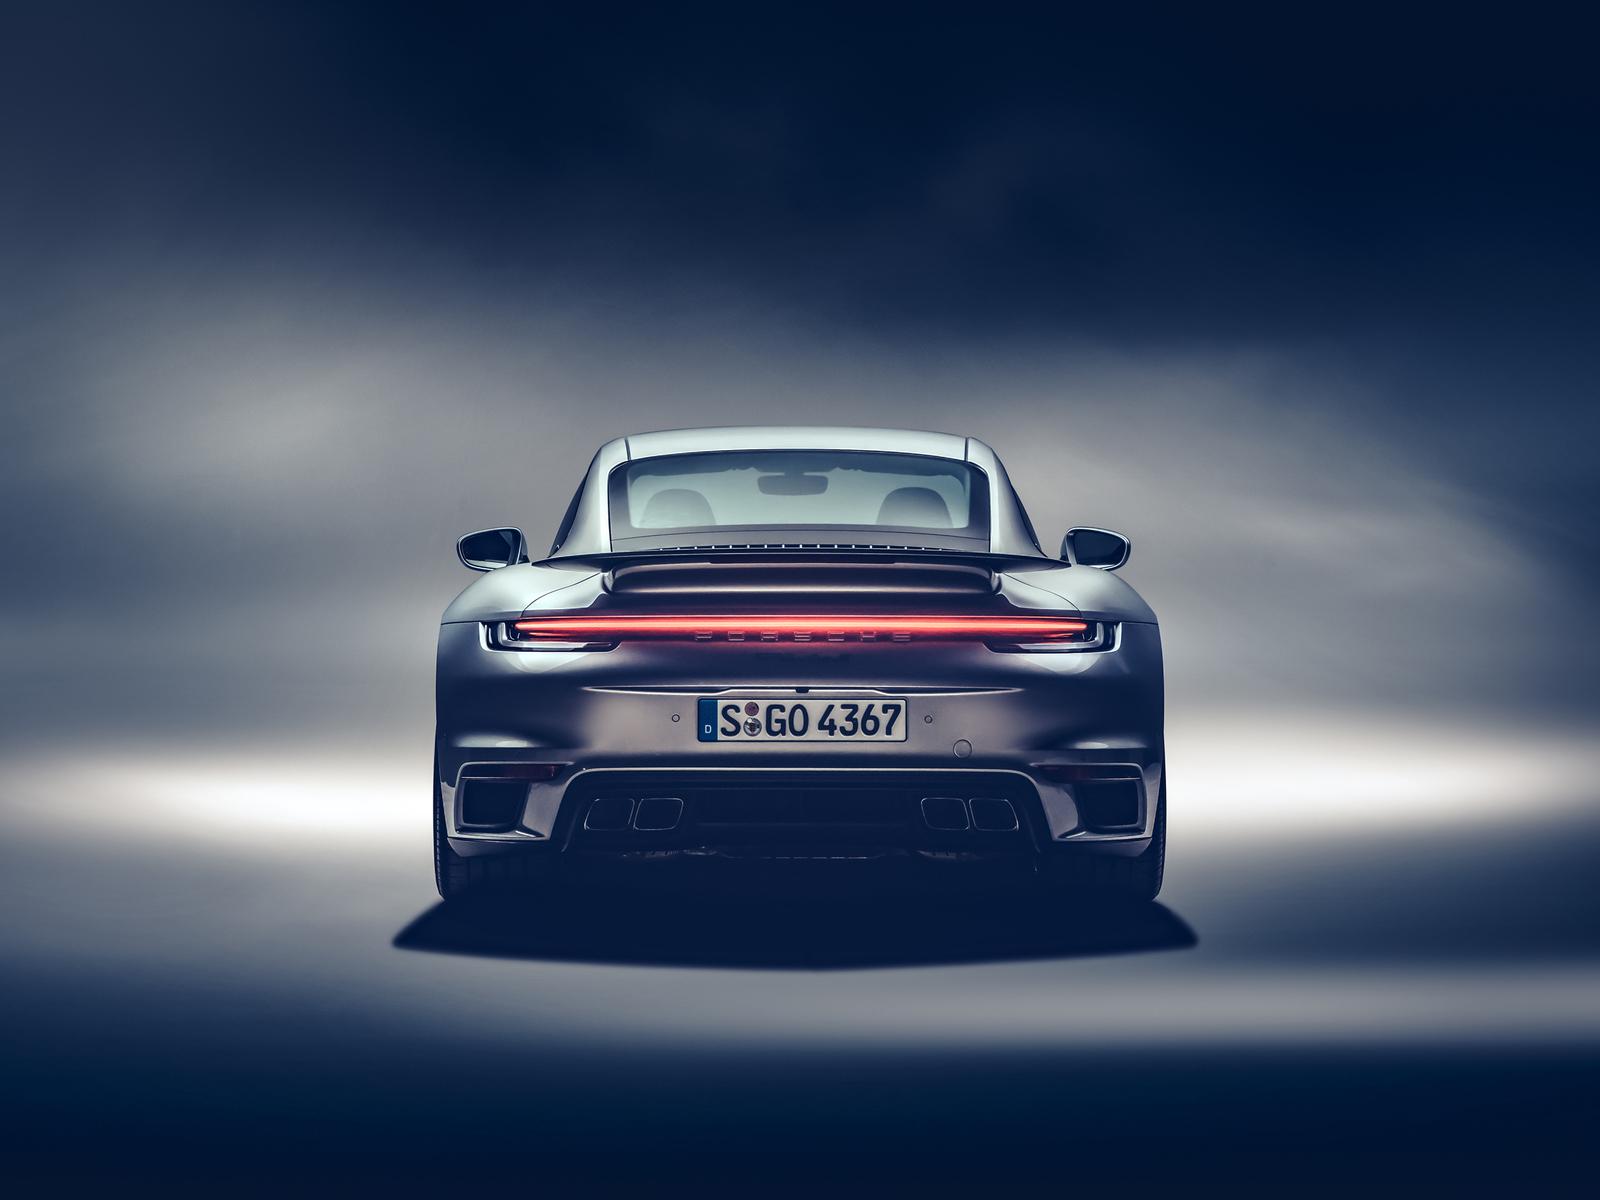 2021-porsche-911-turbo-s-rear-m5.jpg